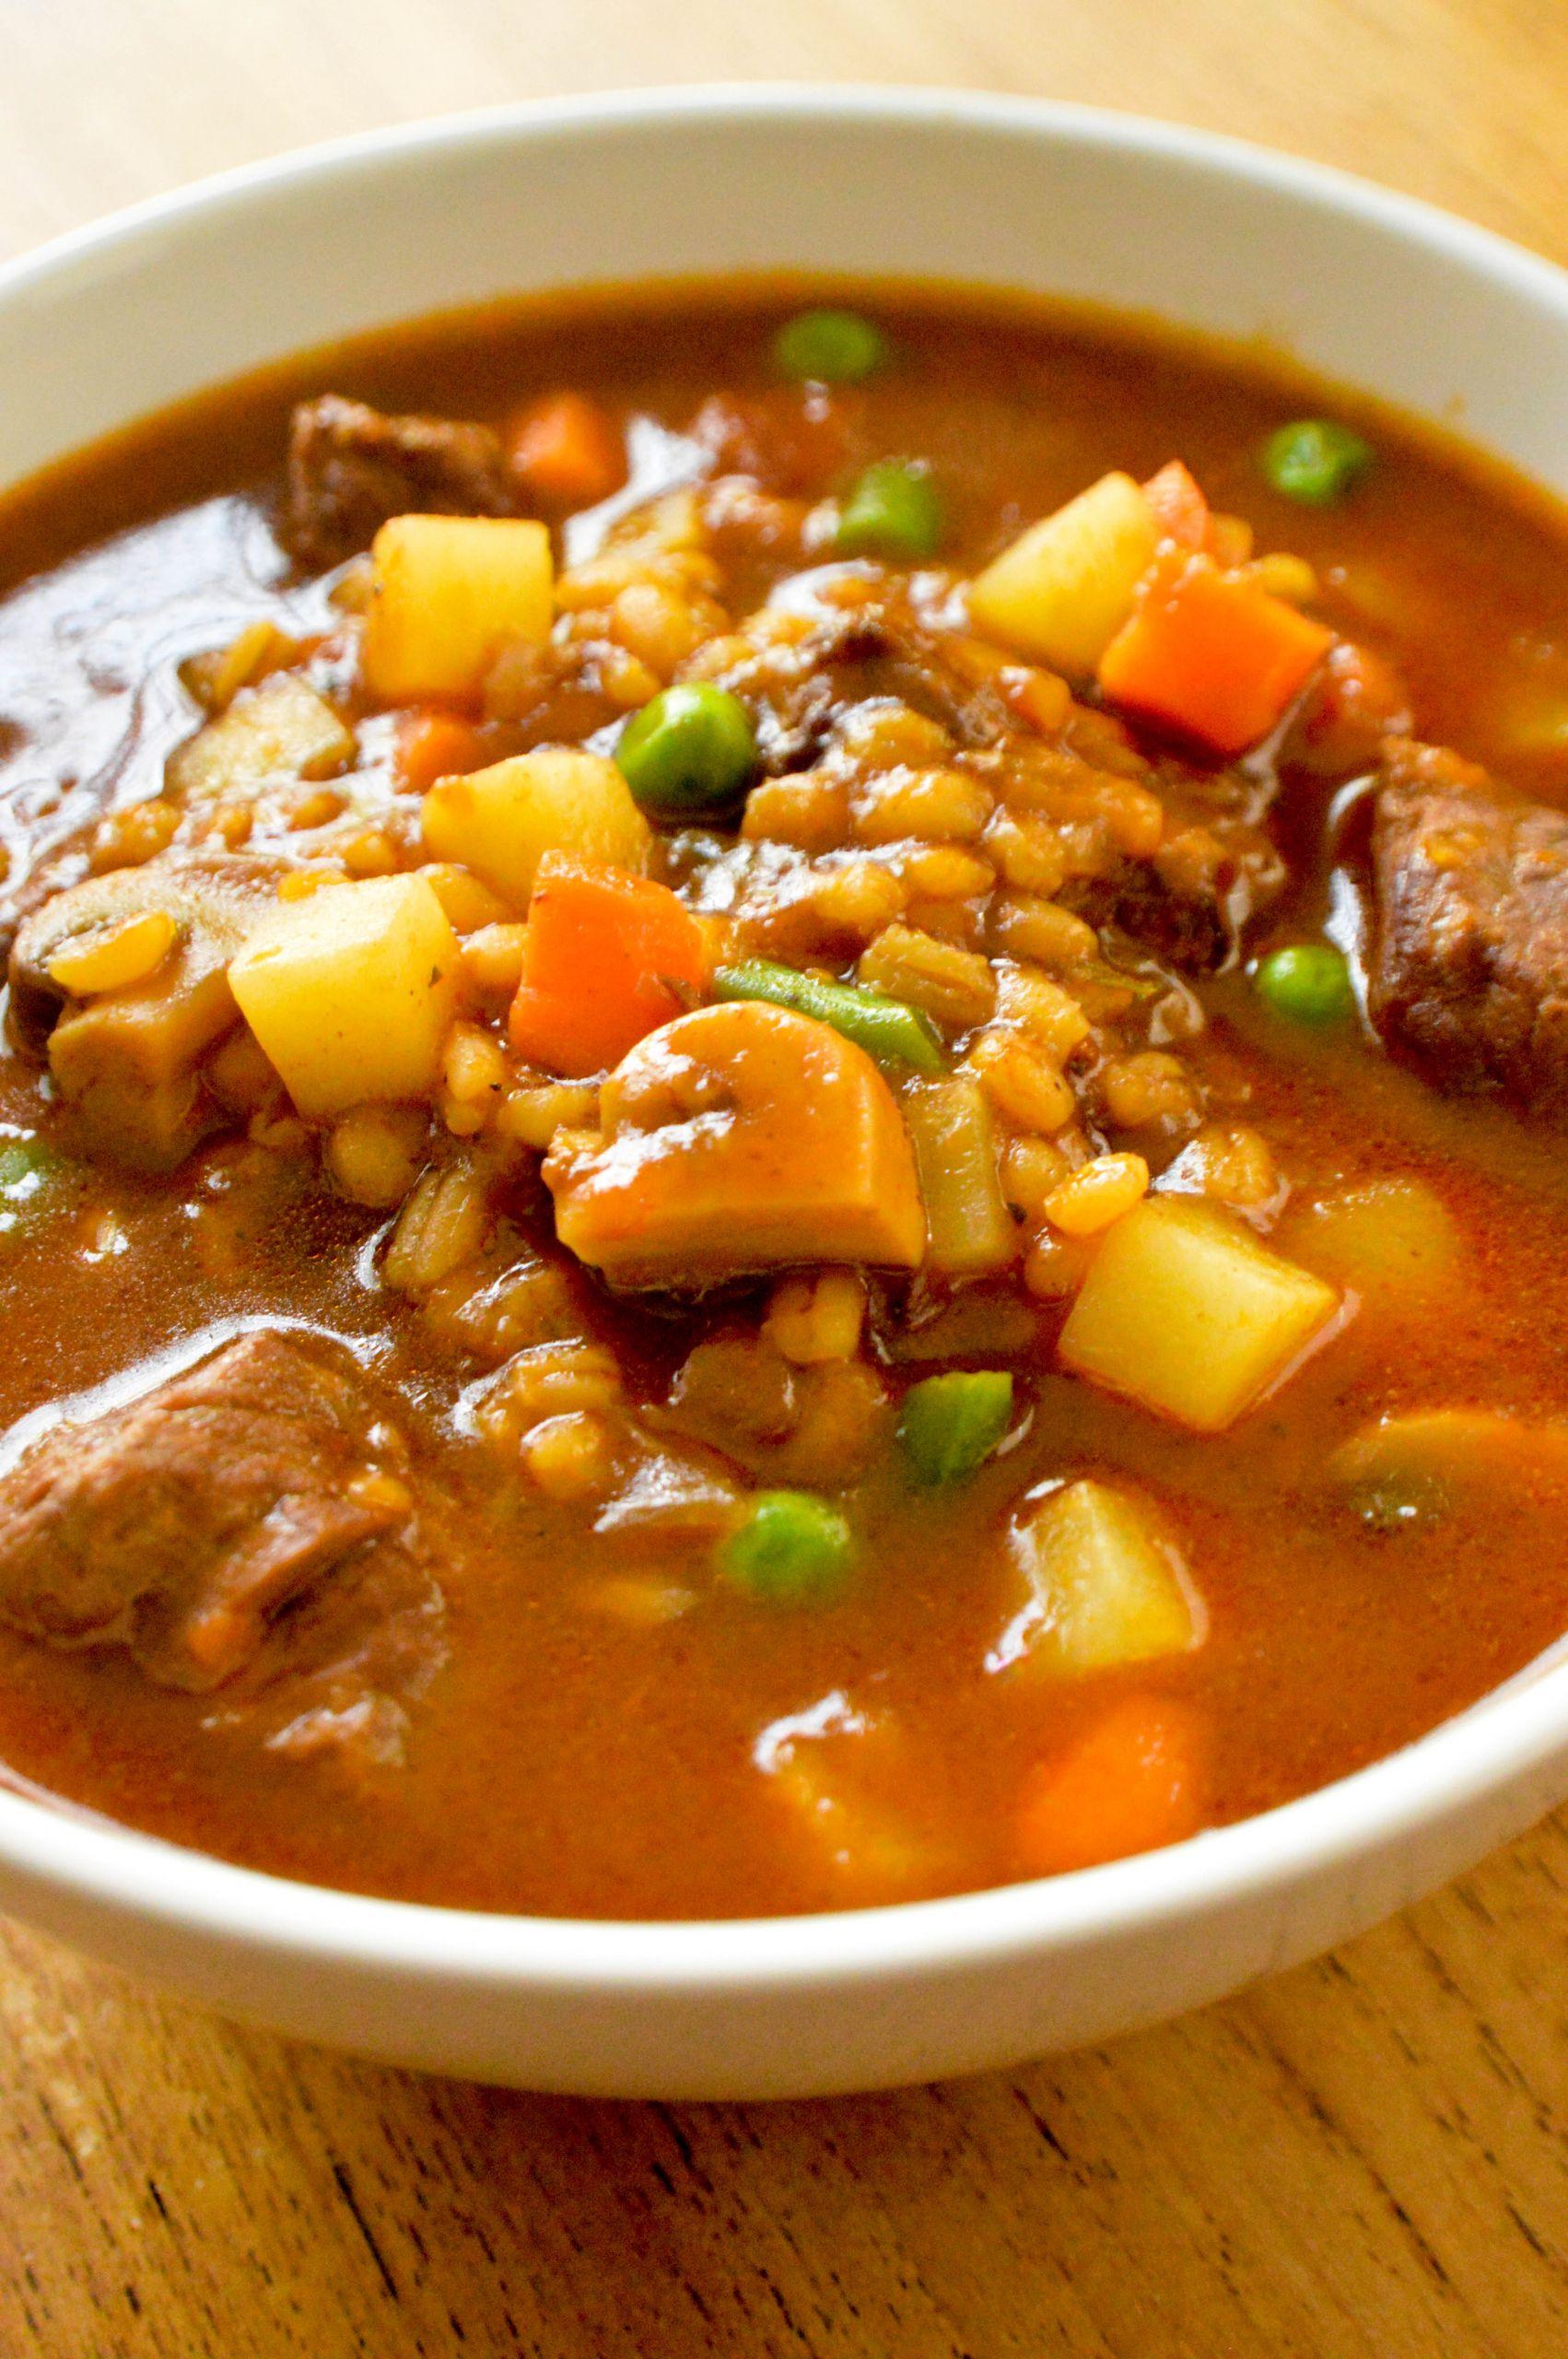 Lamb Barley Stew  Beef and barley stew